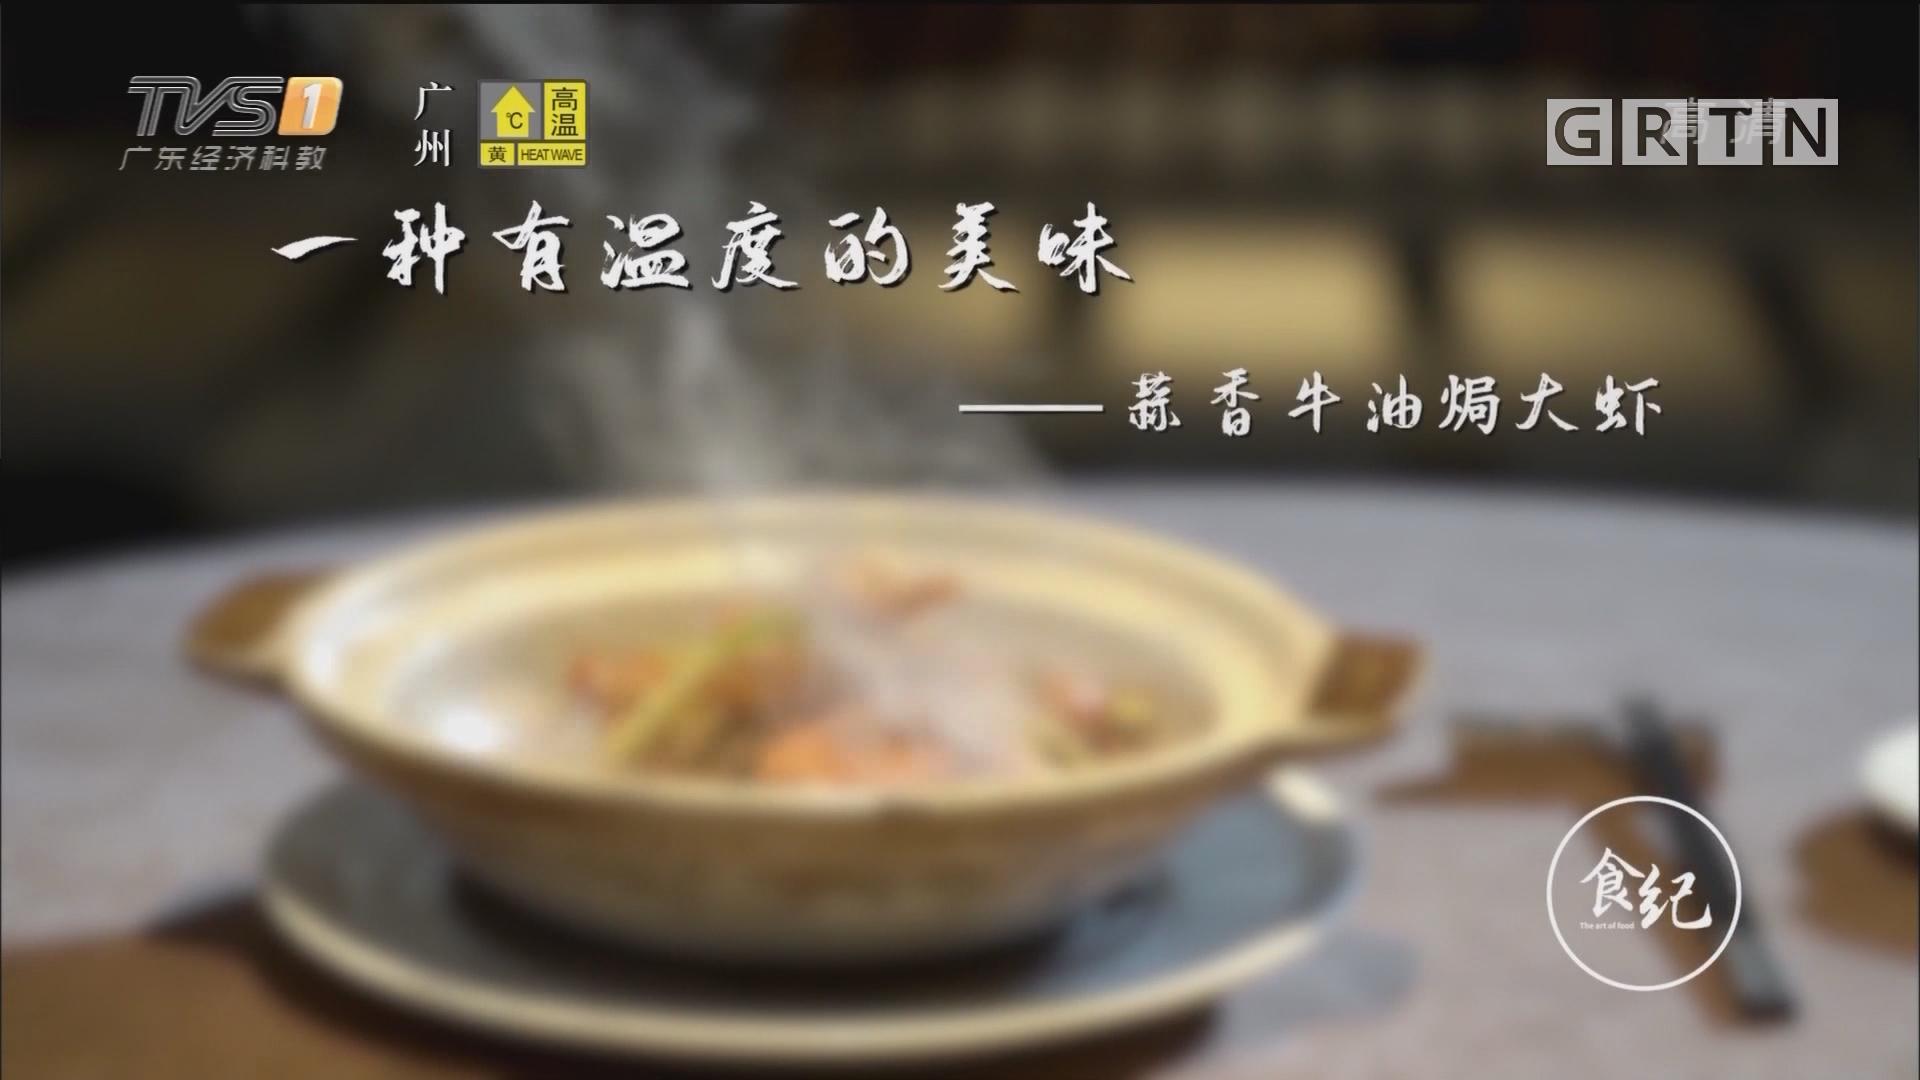 [HD][2019-08-20]马后炮生活+《美食特攻》:蒜香牛油焗大虾